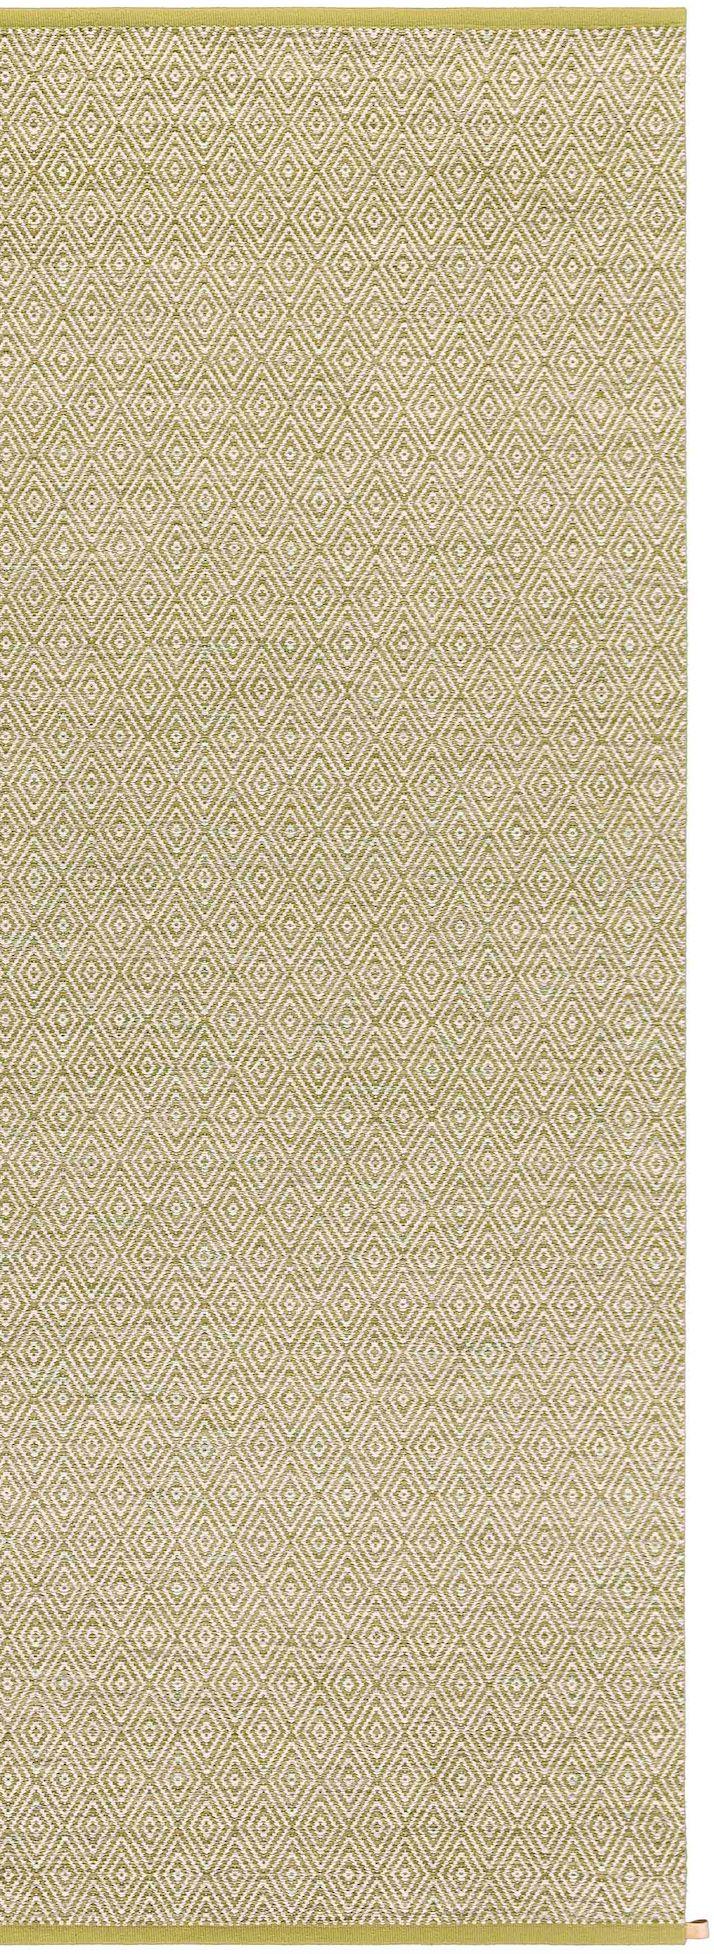 Navy greek key rug transitional entrance foyer libby langdon - Goose Eye Xl Wool Rug Color Straw Size 2 9 X 7